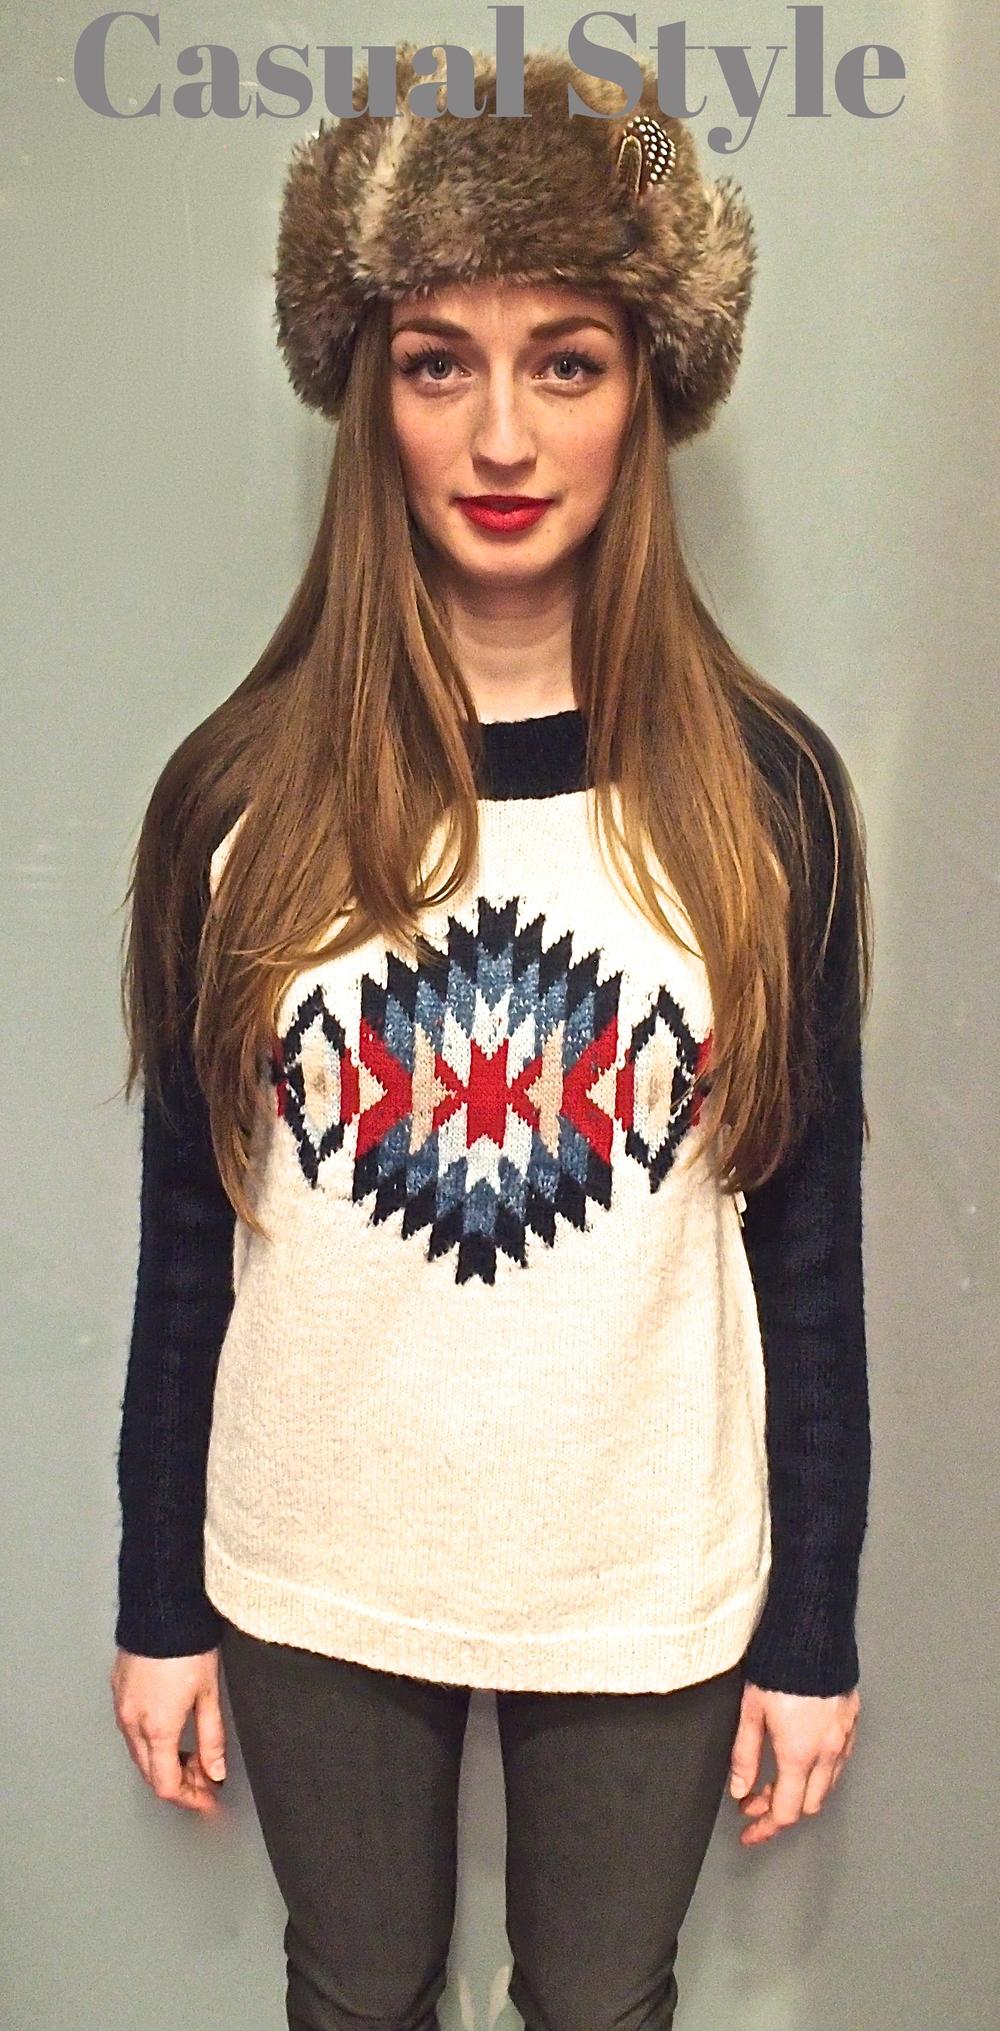 Nobis- Faux fur hat $75, Kingsley-Navajo Crew Sweater $195, JBrand Skinny Jean $269